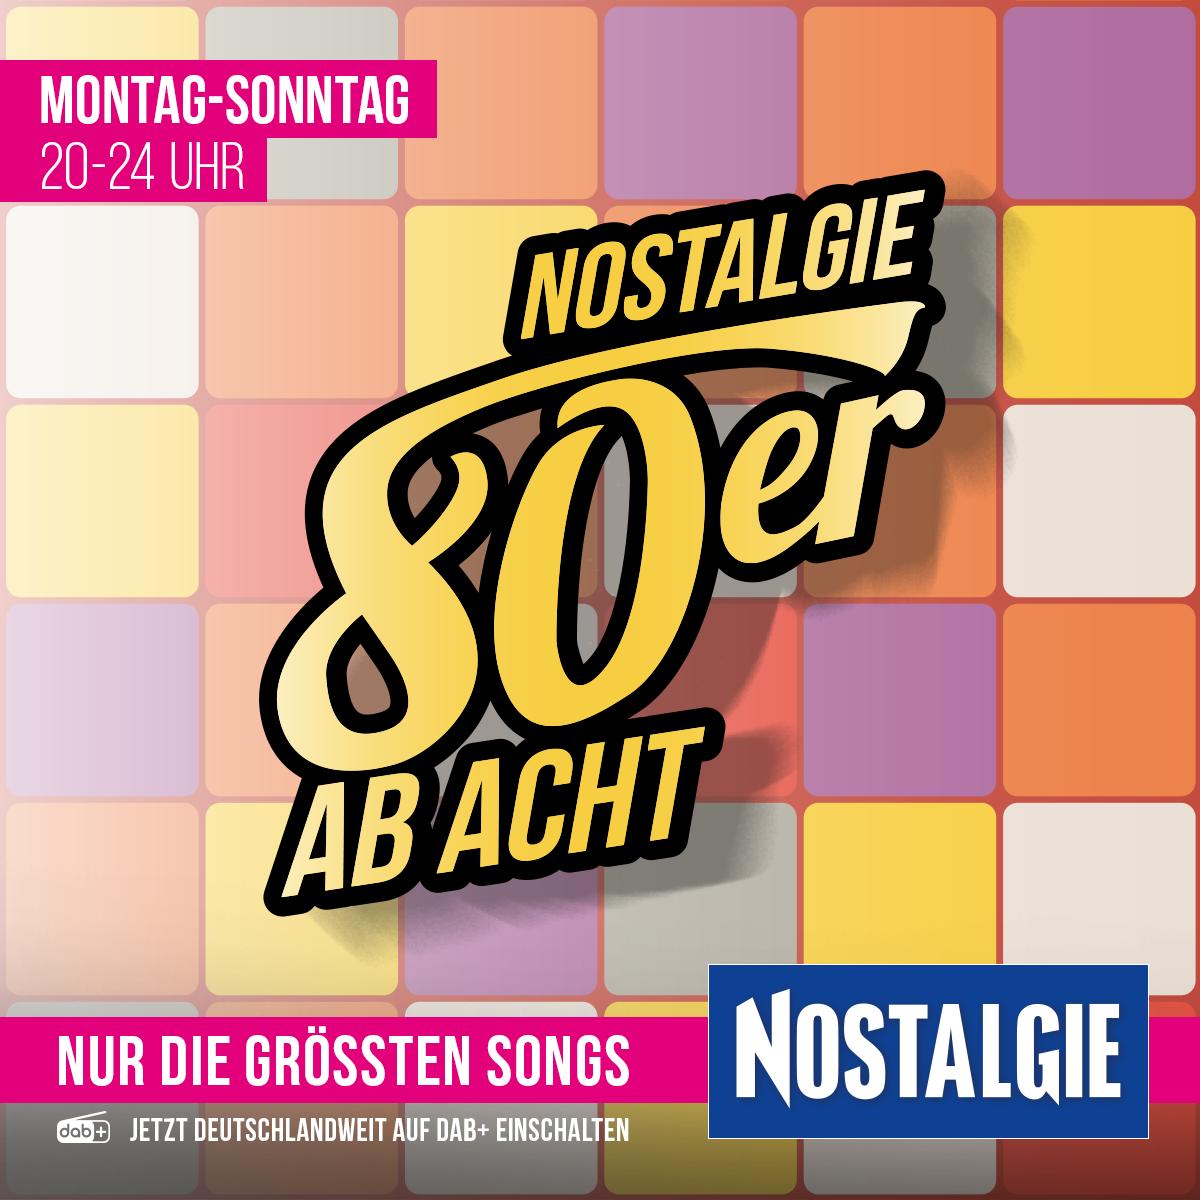 NOSTALGIE 80ER AB ACHT